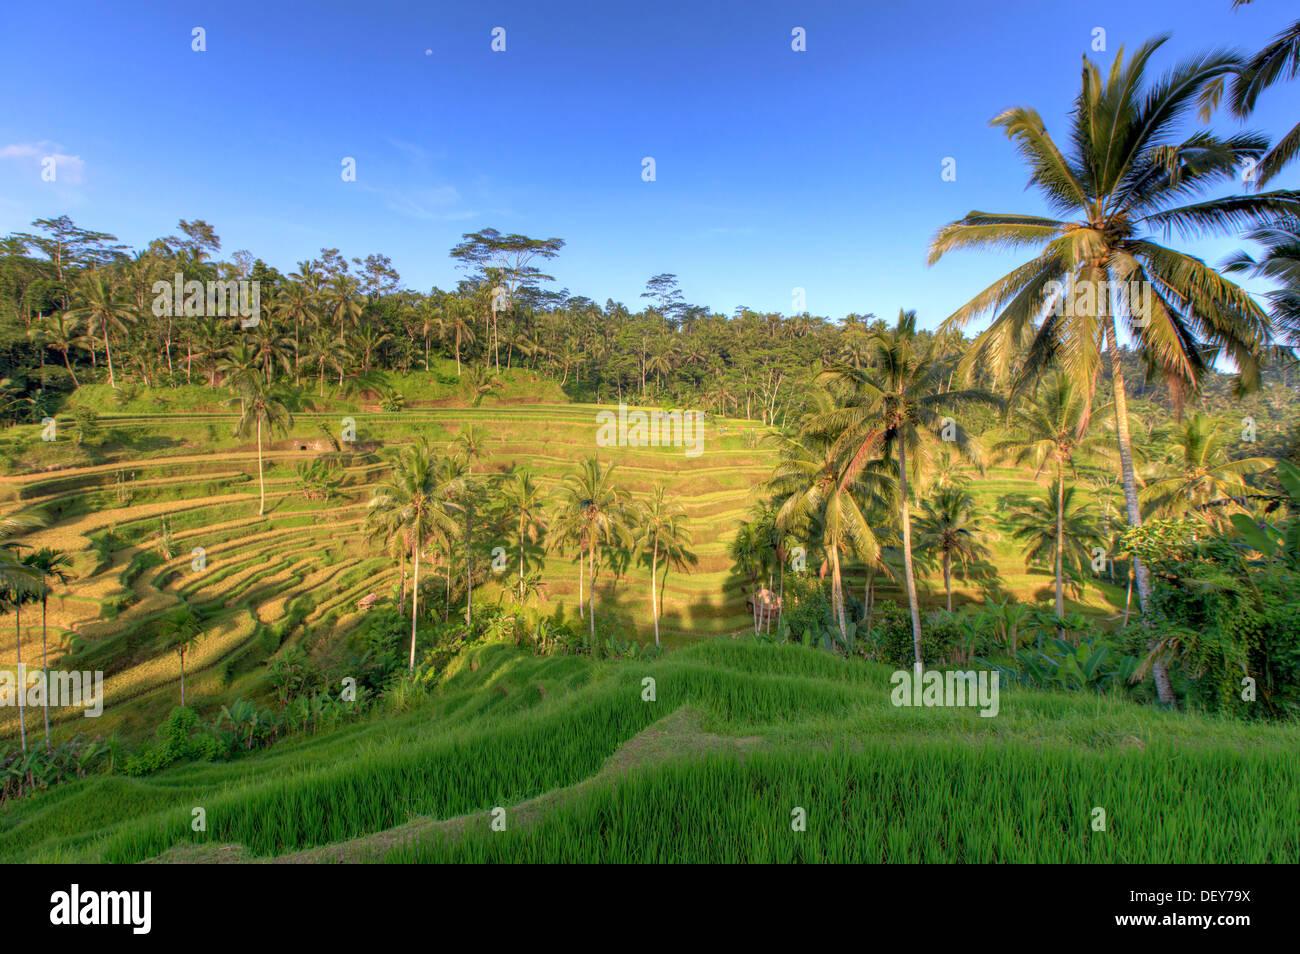 Indonesia, Bali, Ubud, Tegallalang/Ceking terrazas de arroz Imagen De Stock